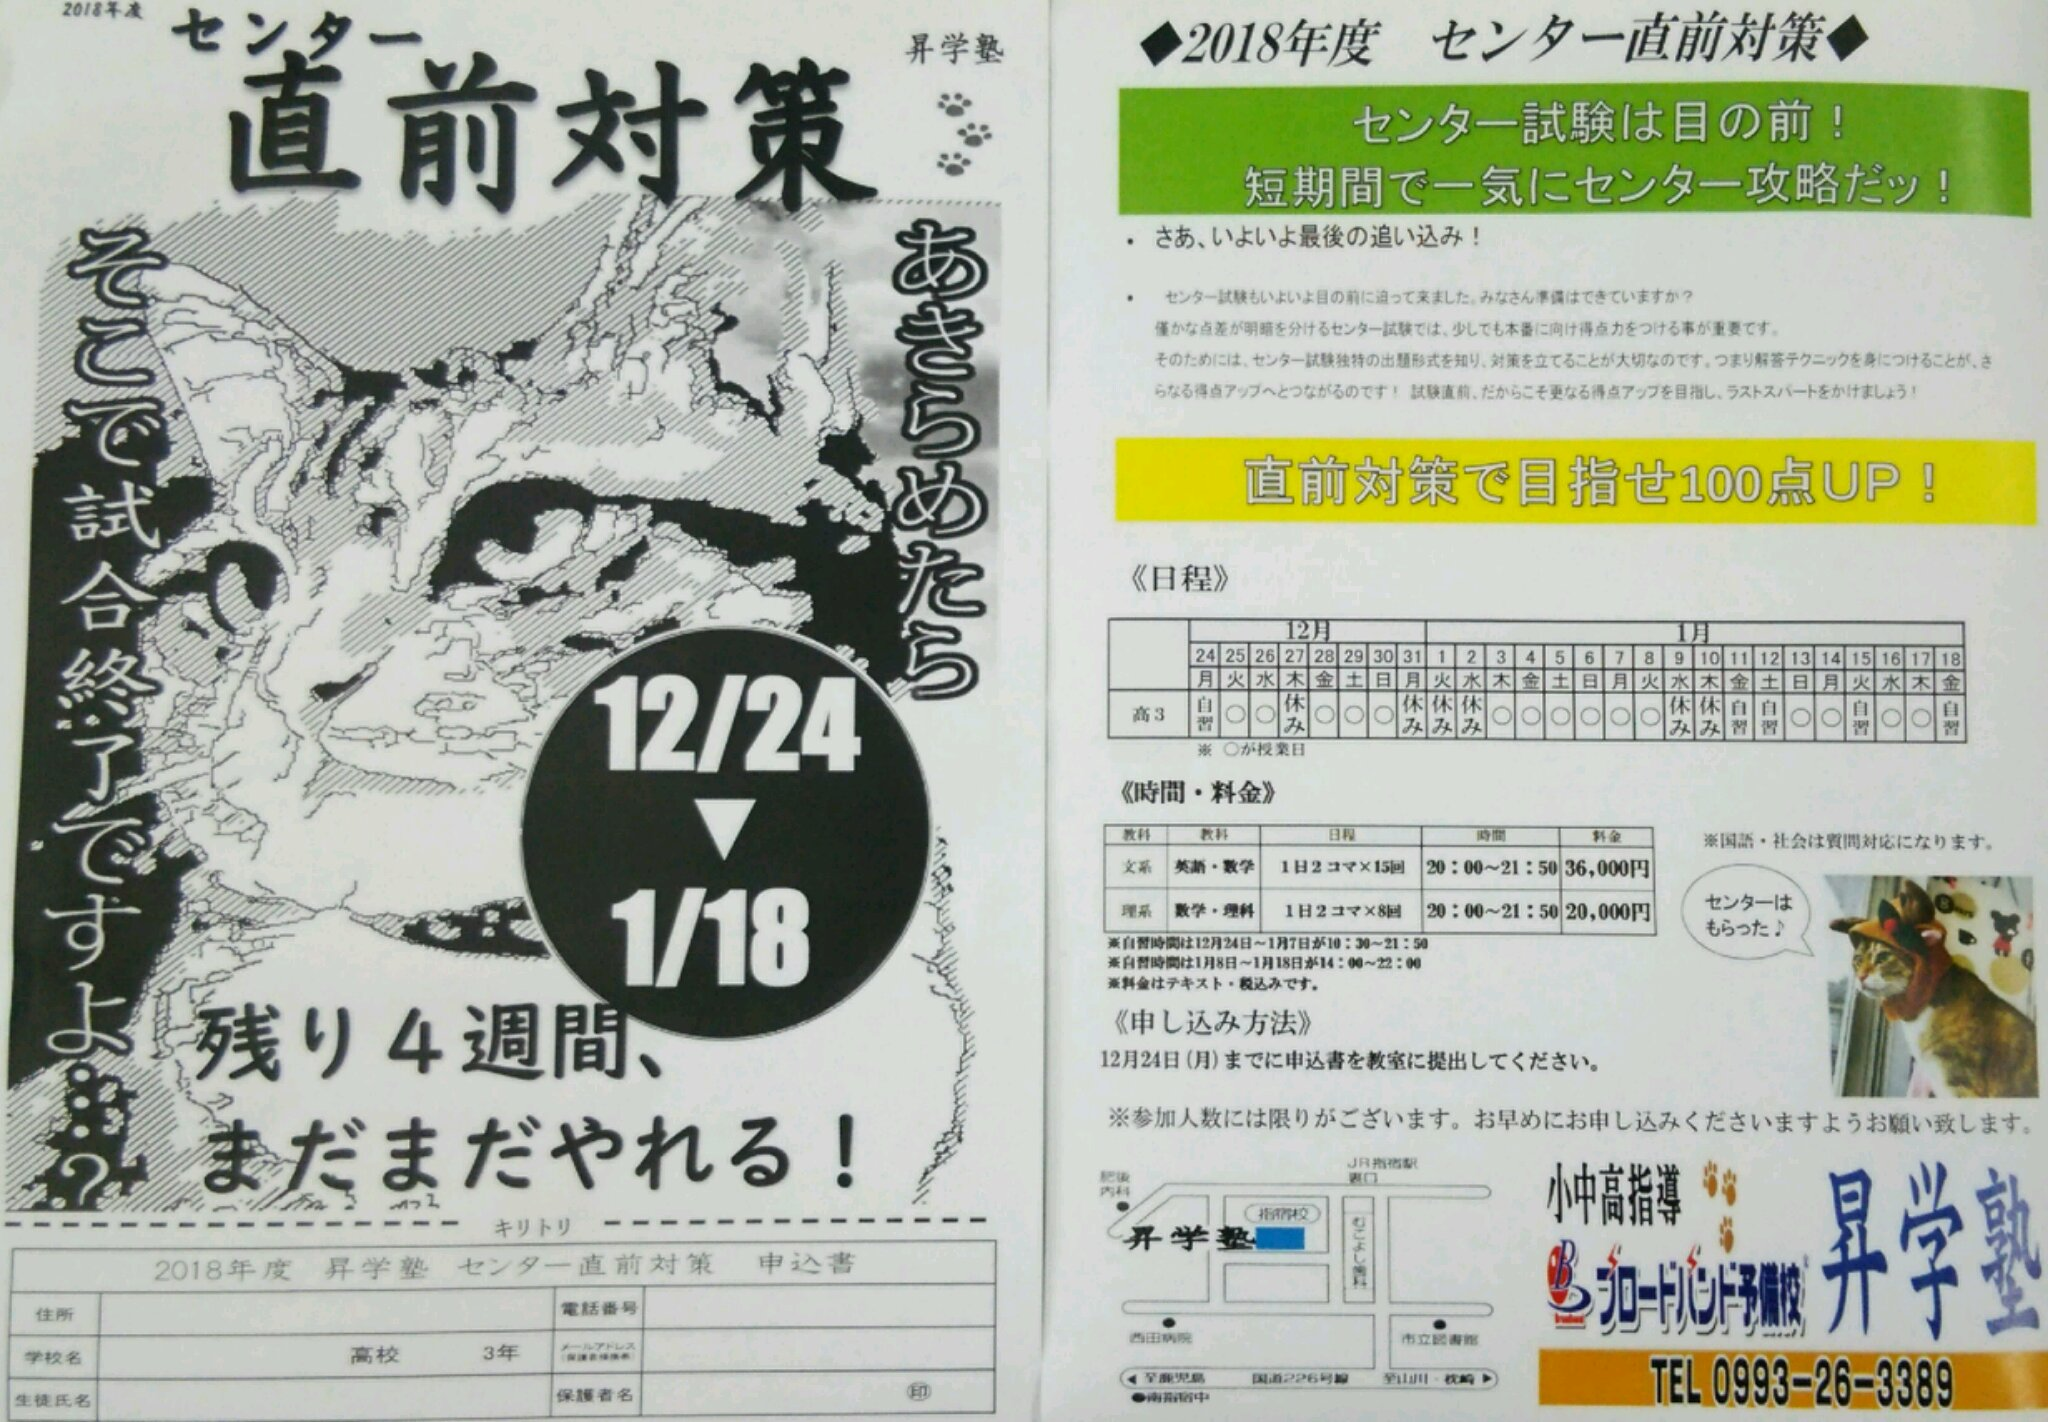 18-12-21-15-01-05-031_deco.jpg